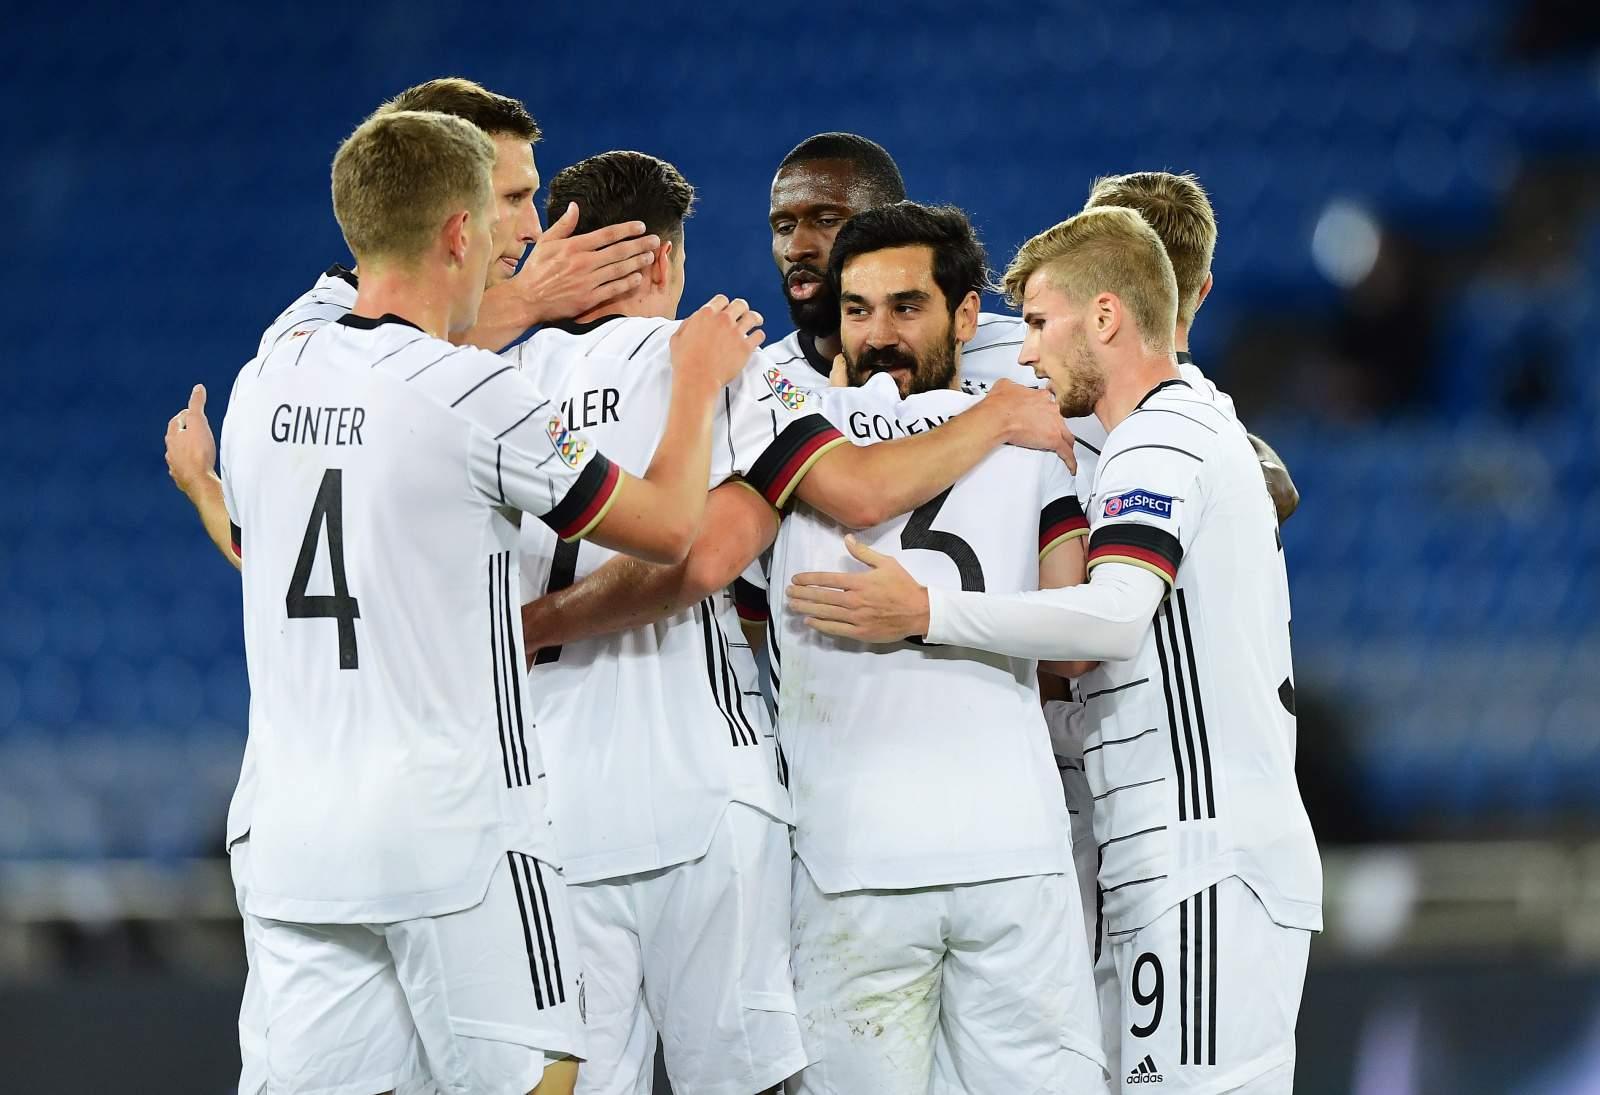 Германия - Латвия - 7:1 (закончен)